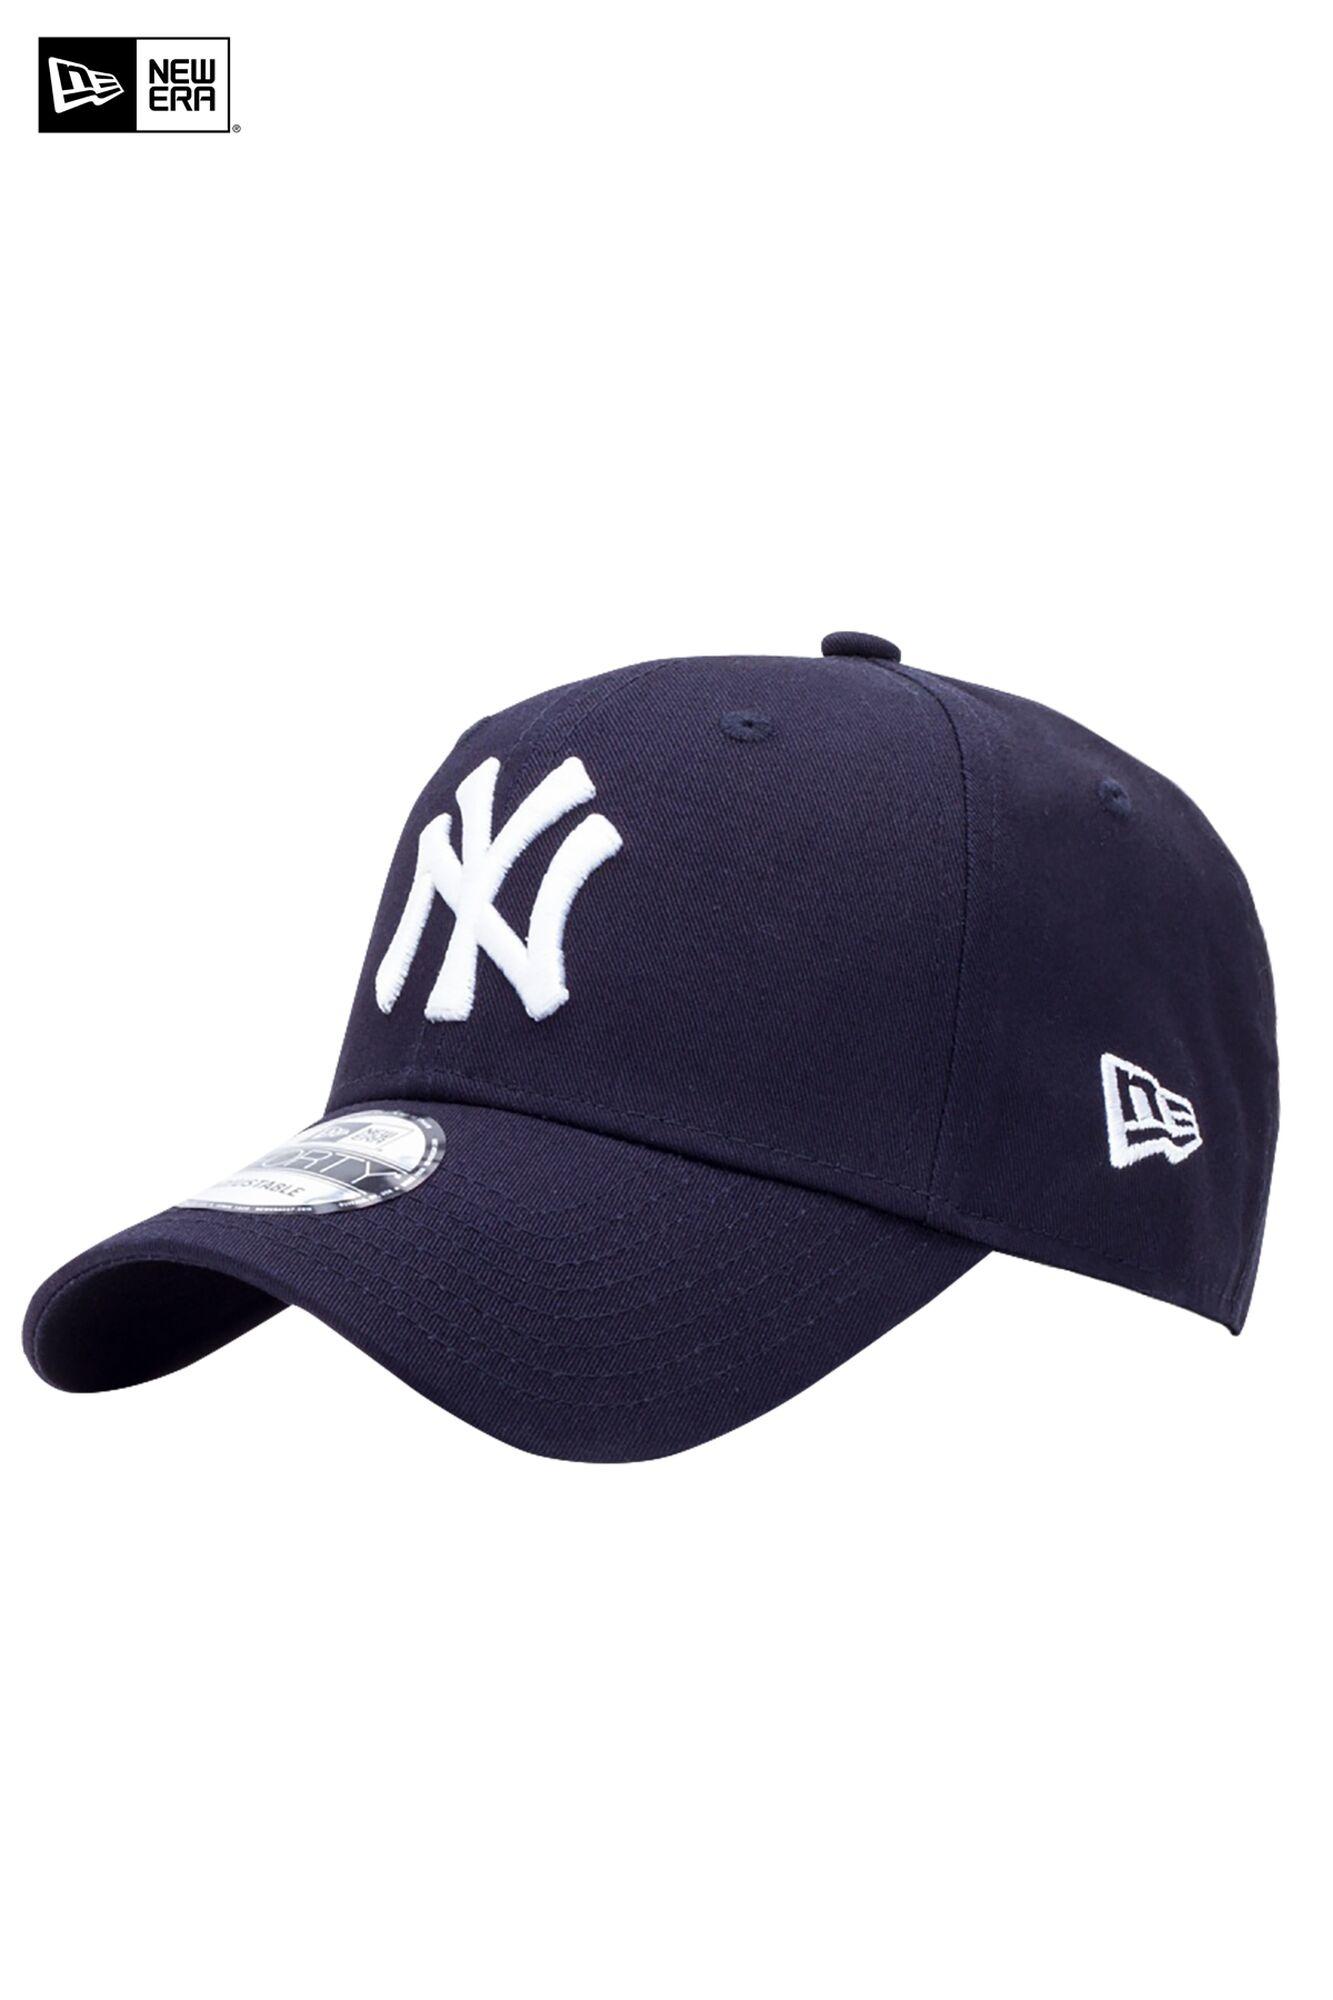 NY 9forty navy/white adjustable-1